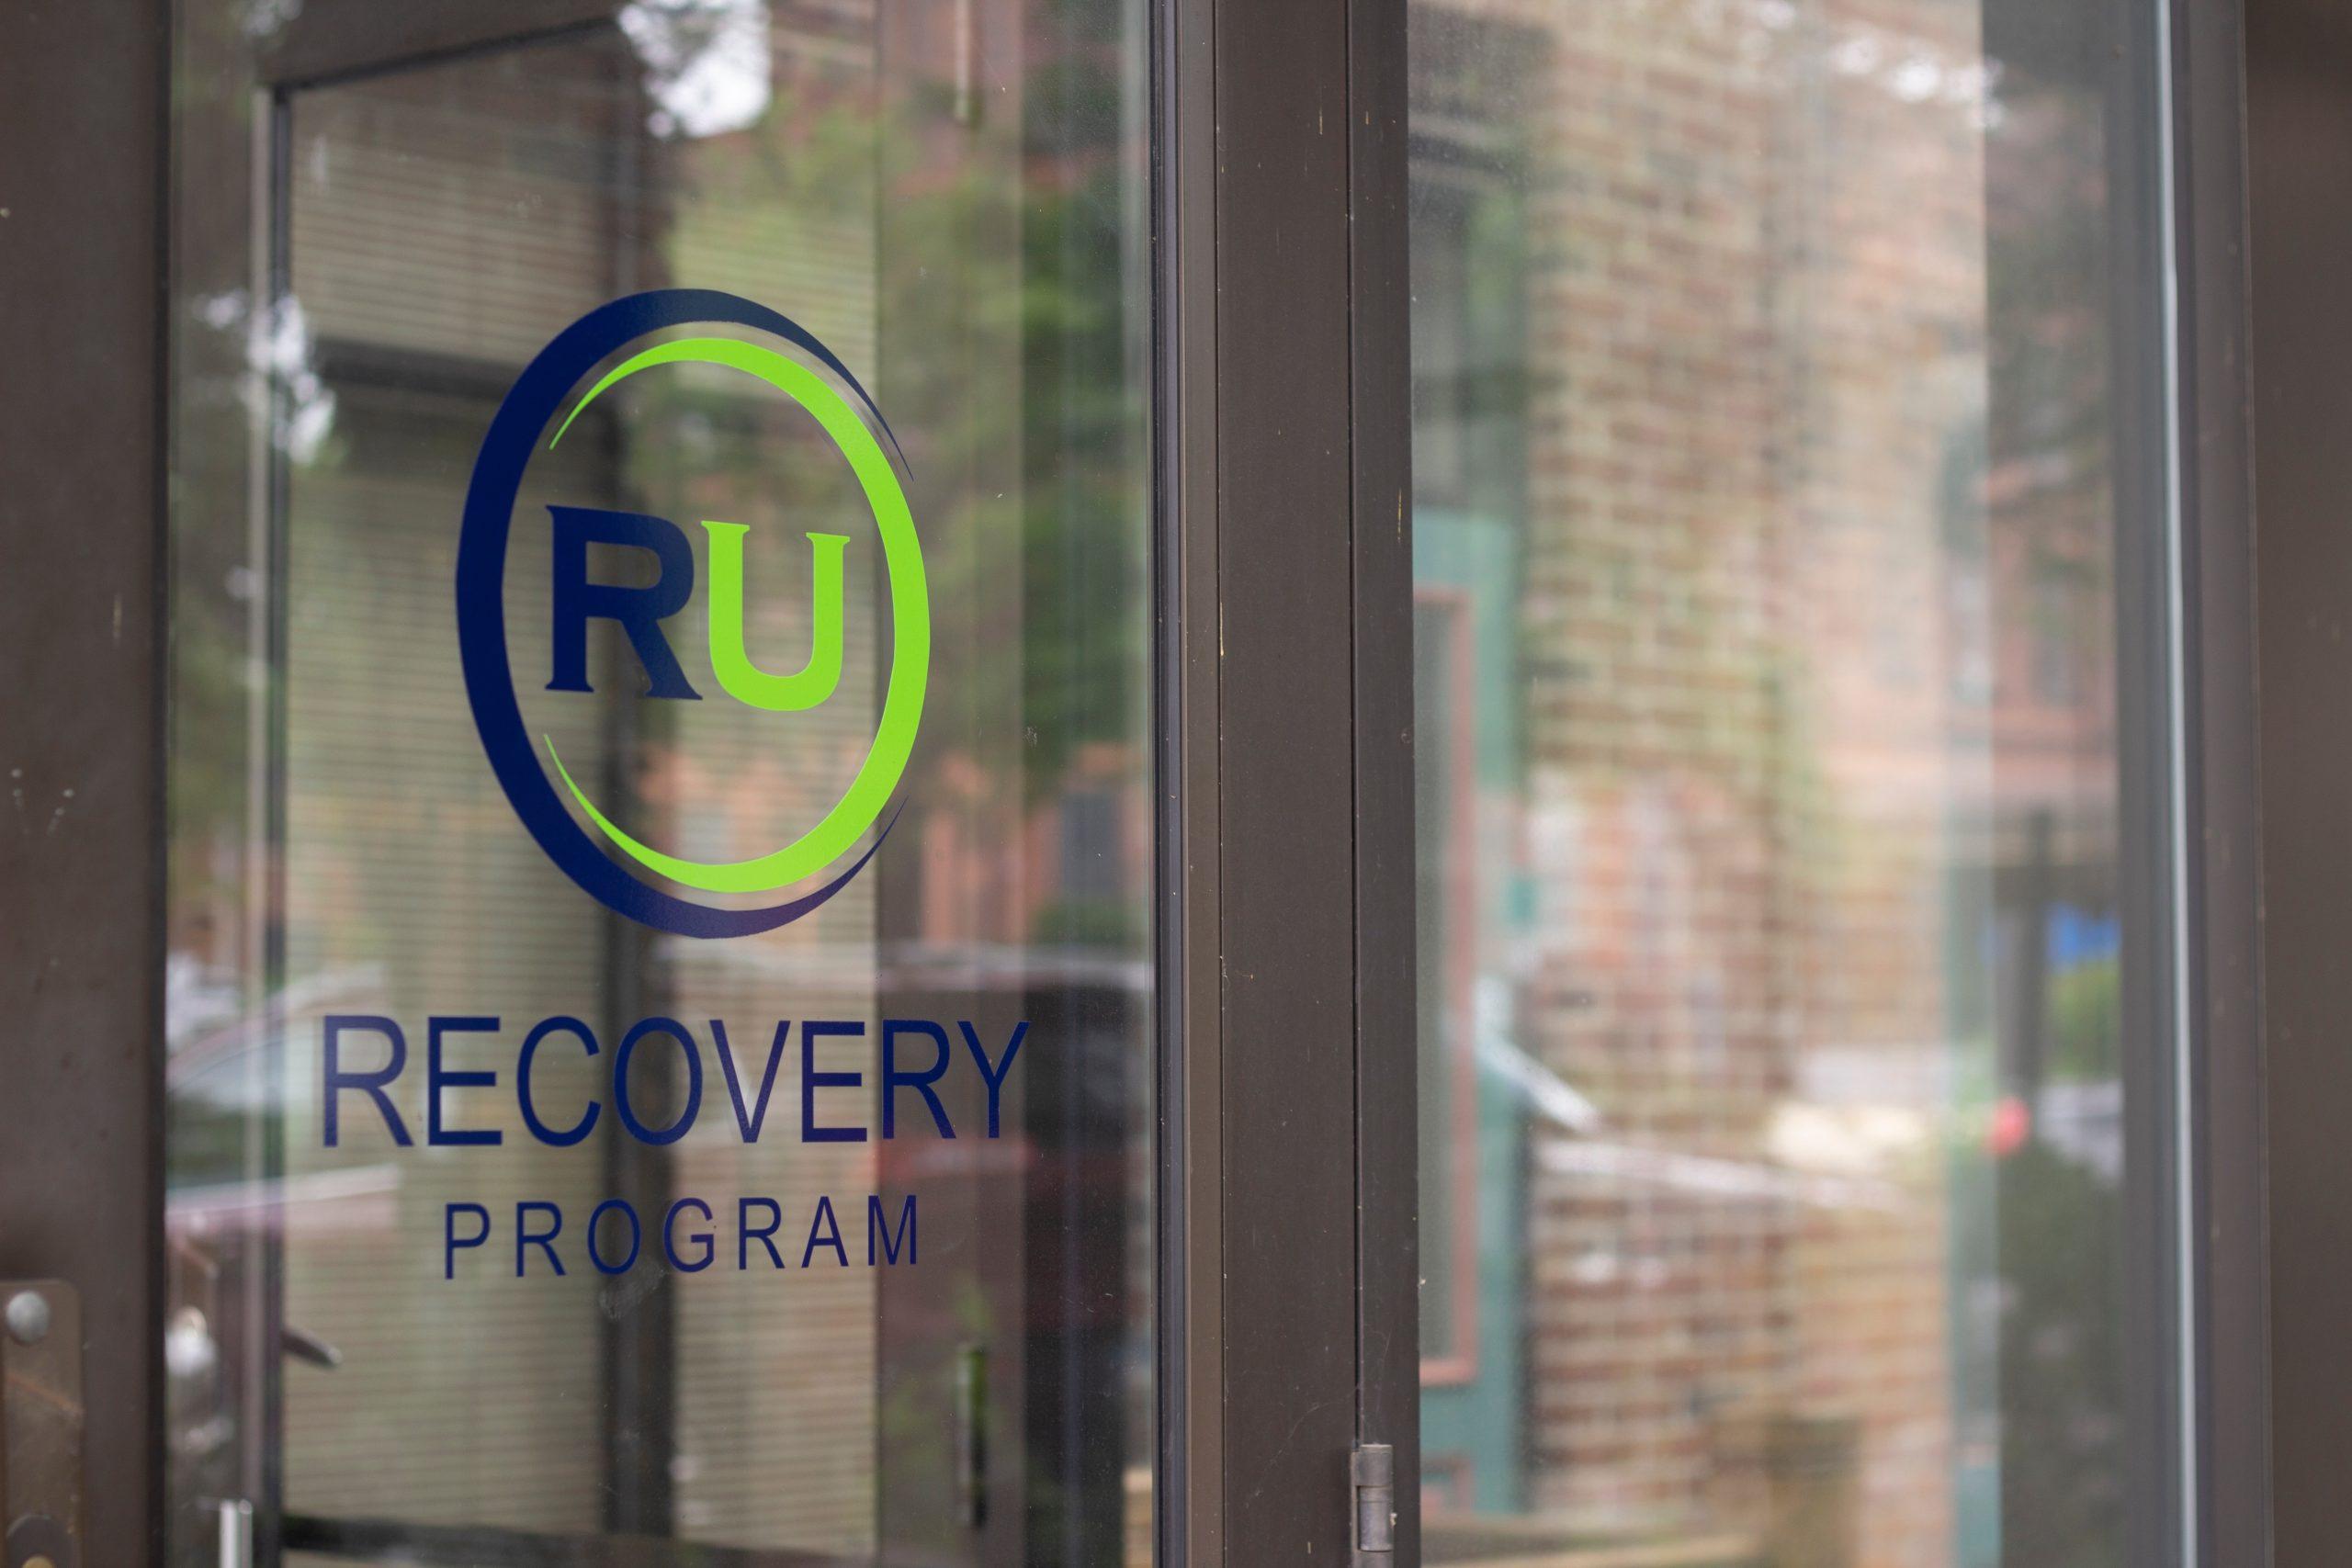 ru-recovery-ministries-hDcNlozU8XA-unsplash